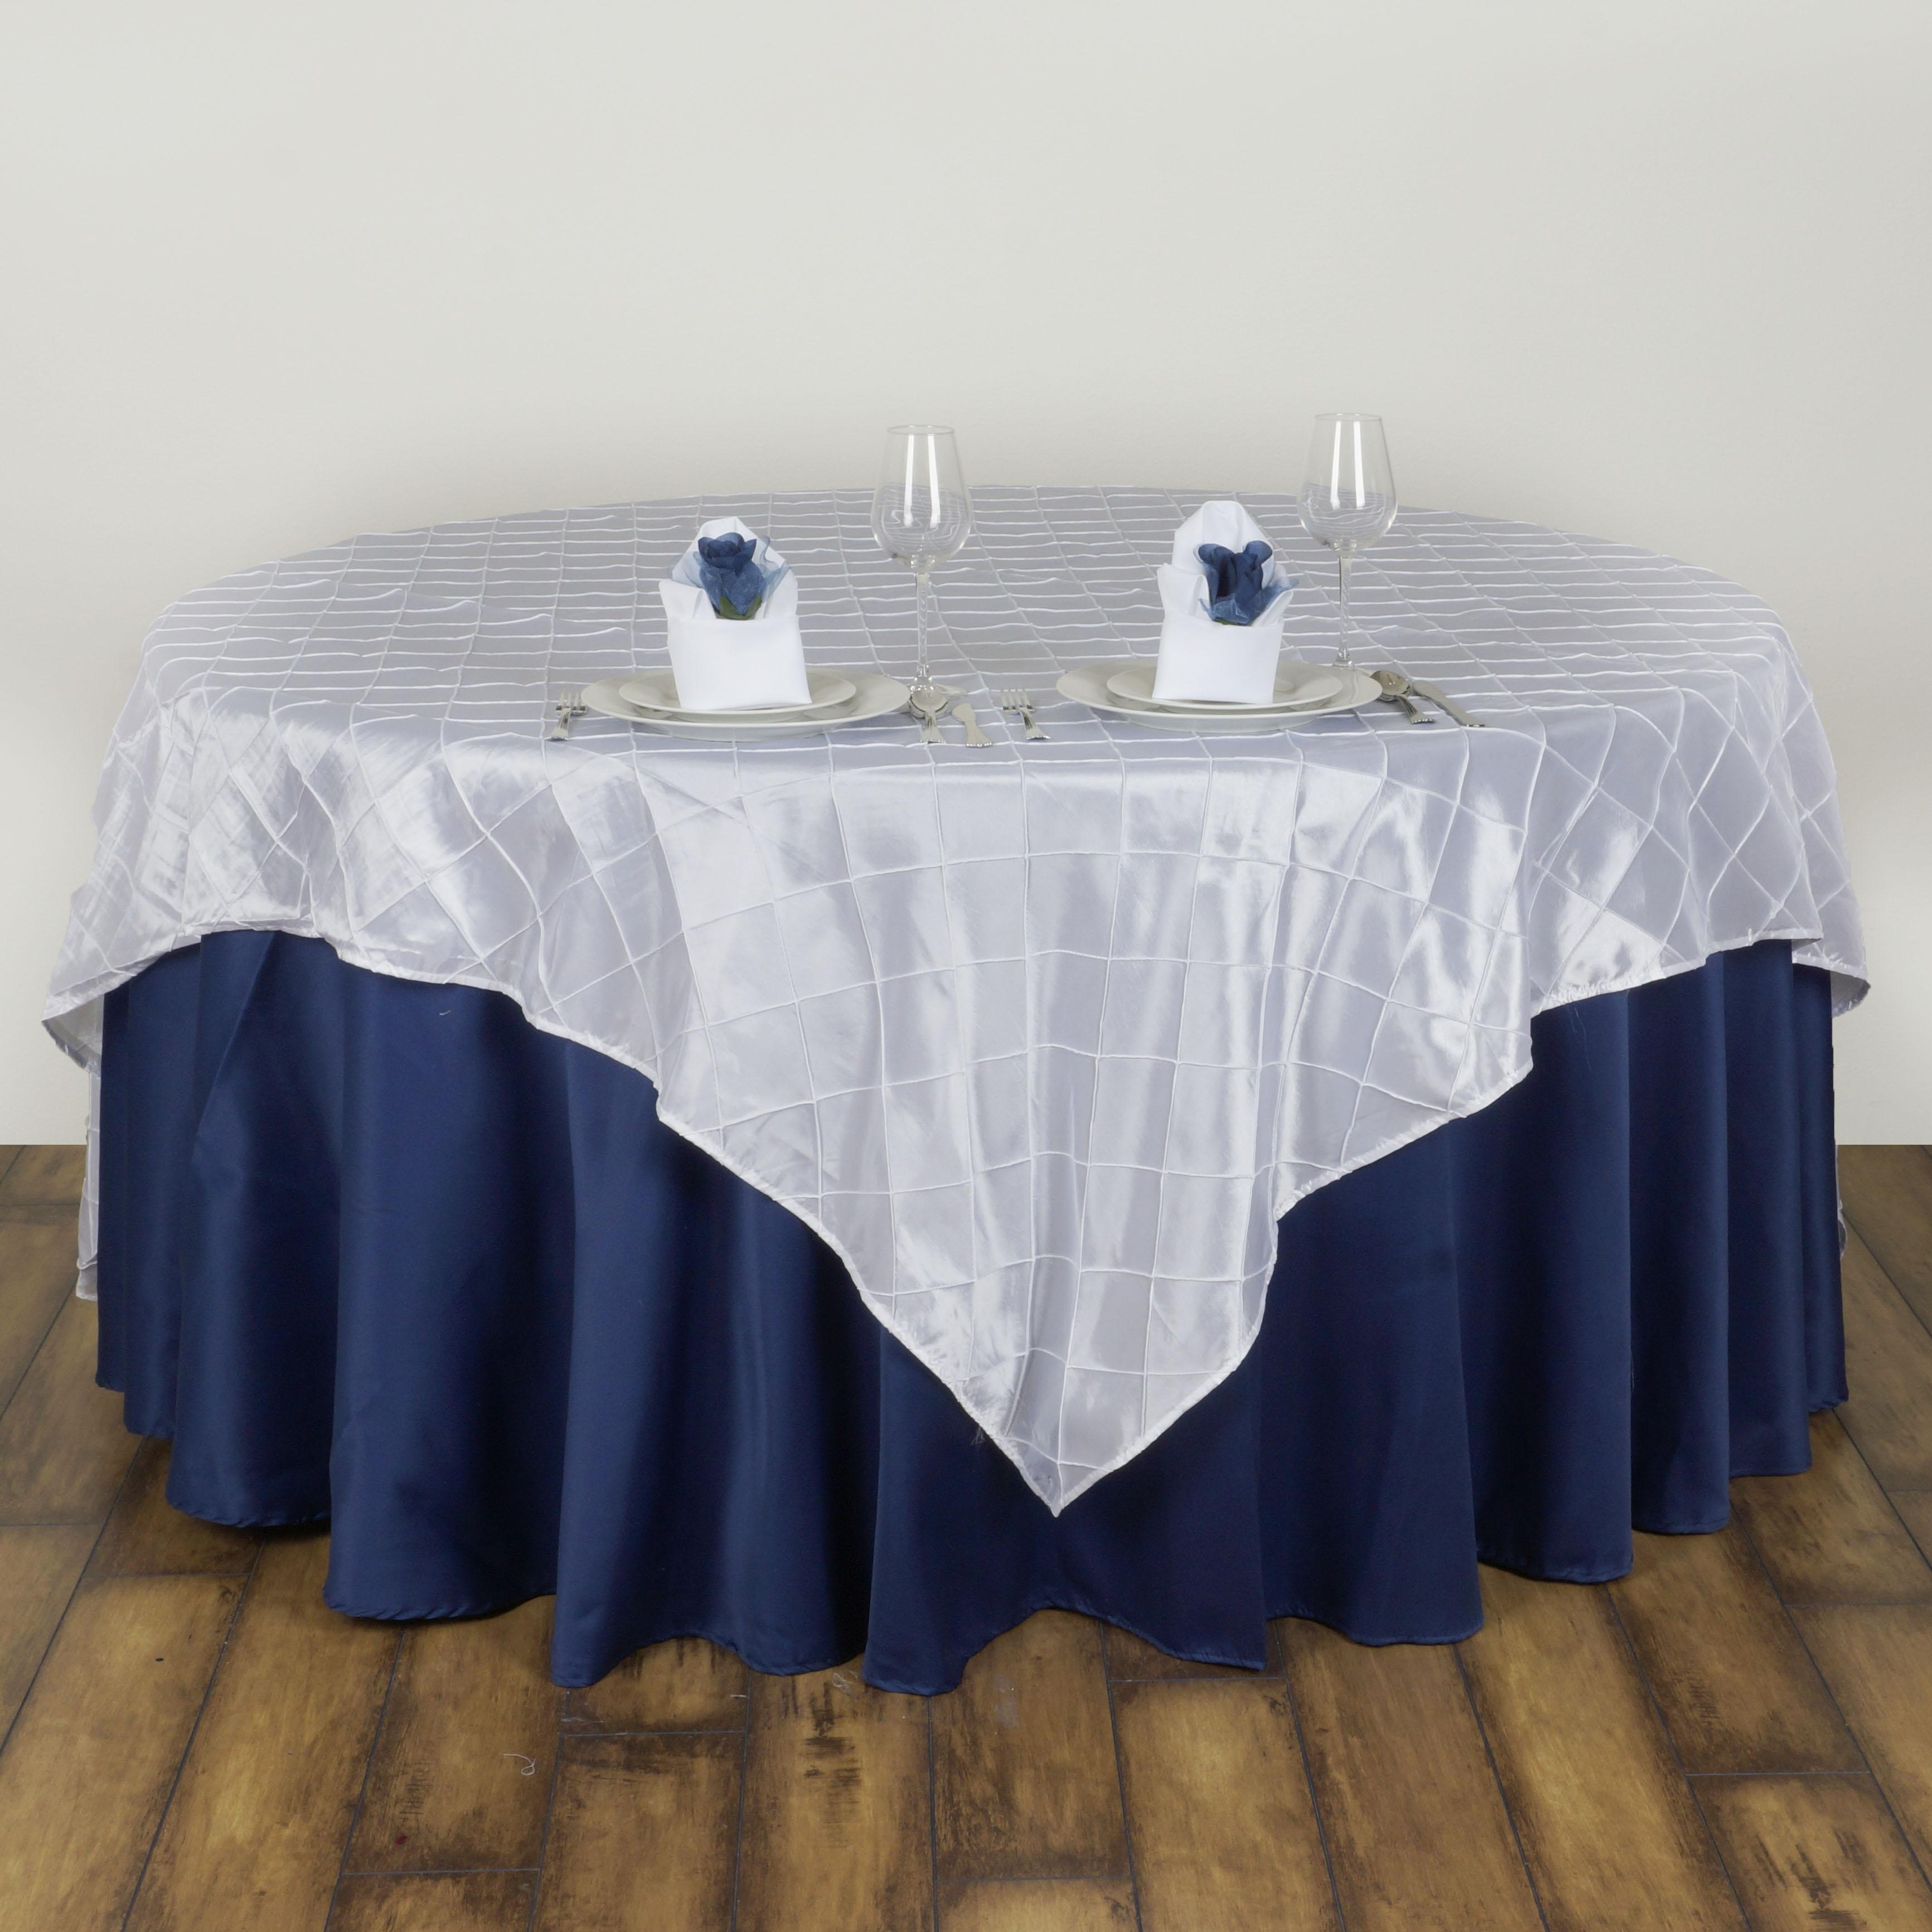 "Wedding Tablecloths: 6 Pcs 72x72"" Square Pintuck TABLE OVERLAYS Wedding Linens"